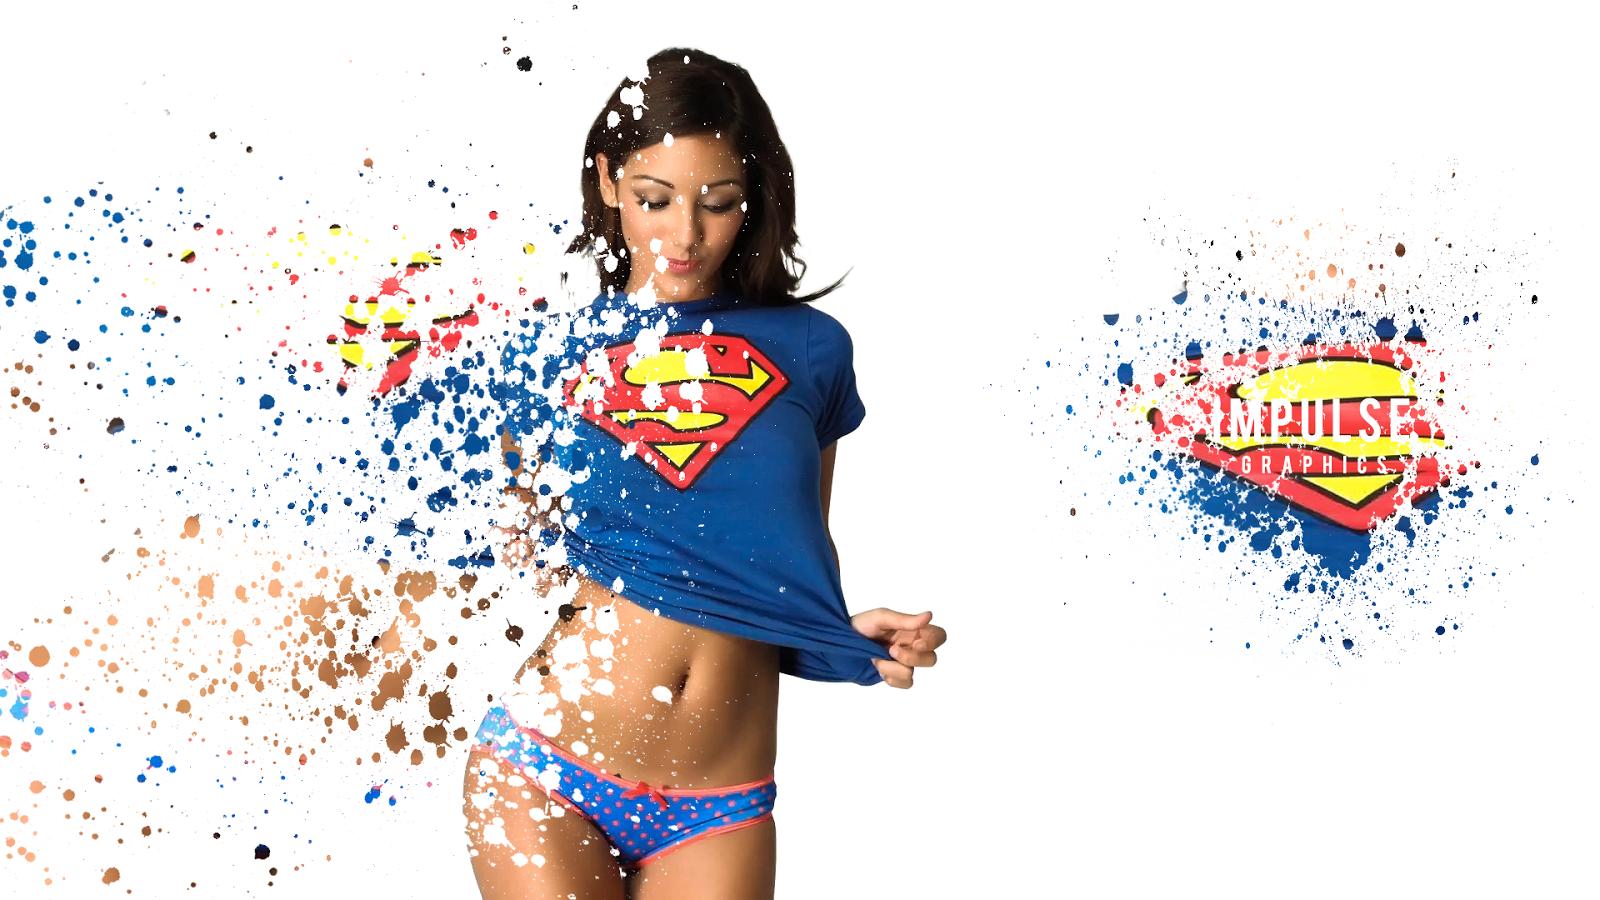 ImpulseGraphics: Melanie Iglesias Superman, ImpulseGraphics